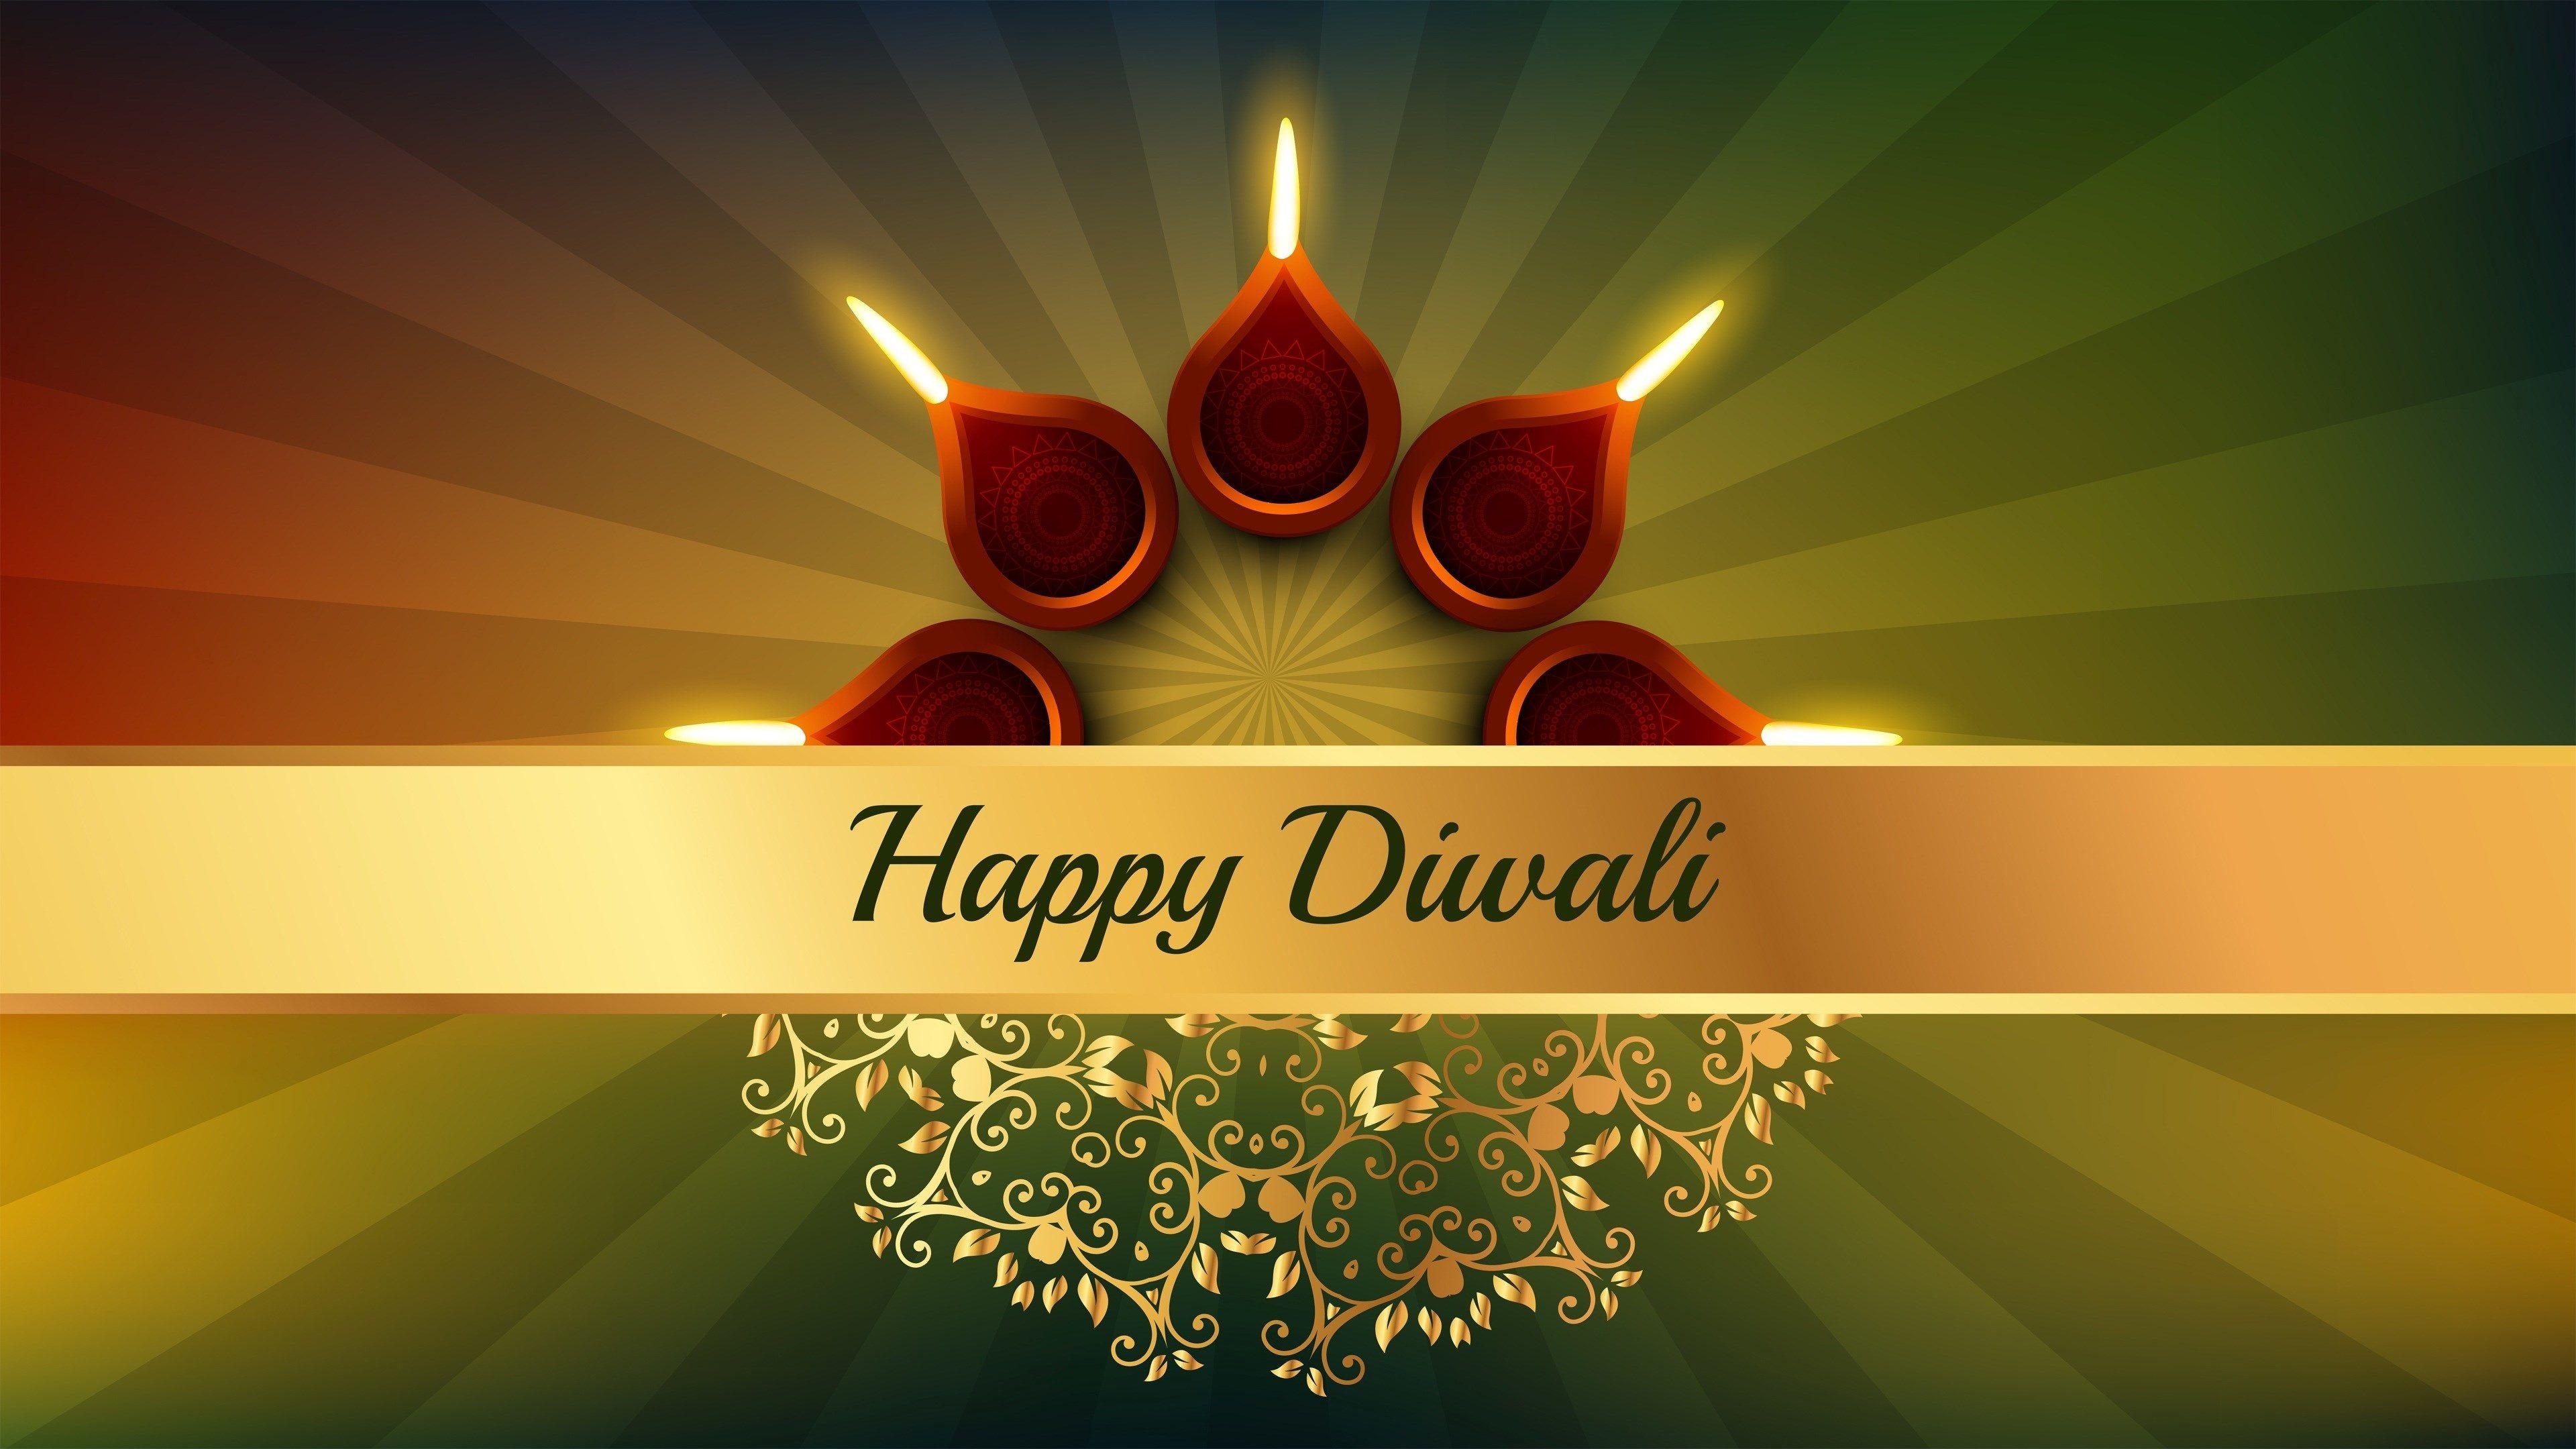 3840x2160 Happy Diwali 4k Full Wallpaper Happy Diwali Wallpapers Diwali Greetings Happy Diwali Happy diwali hd wallpaper download